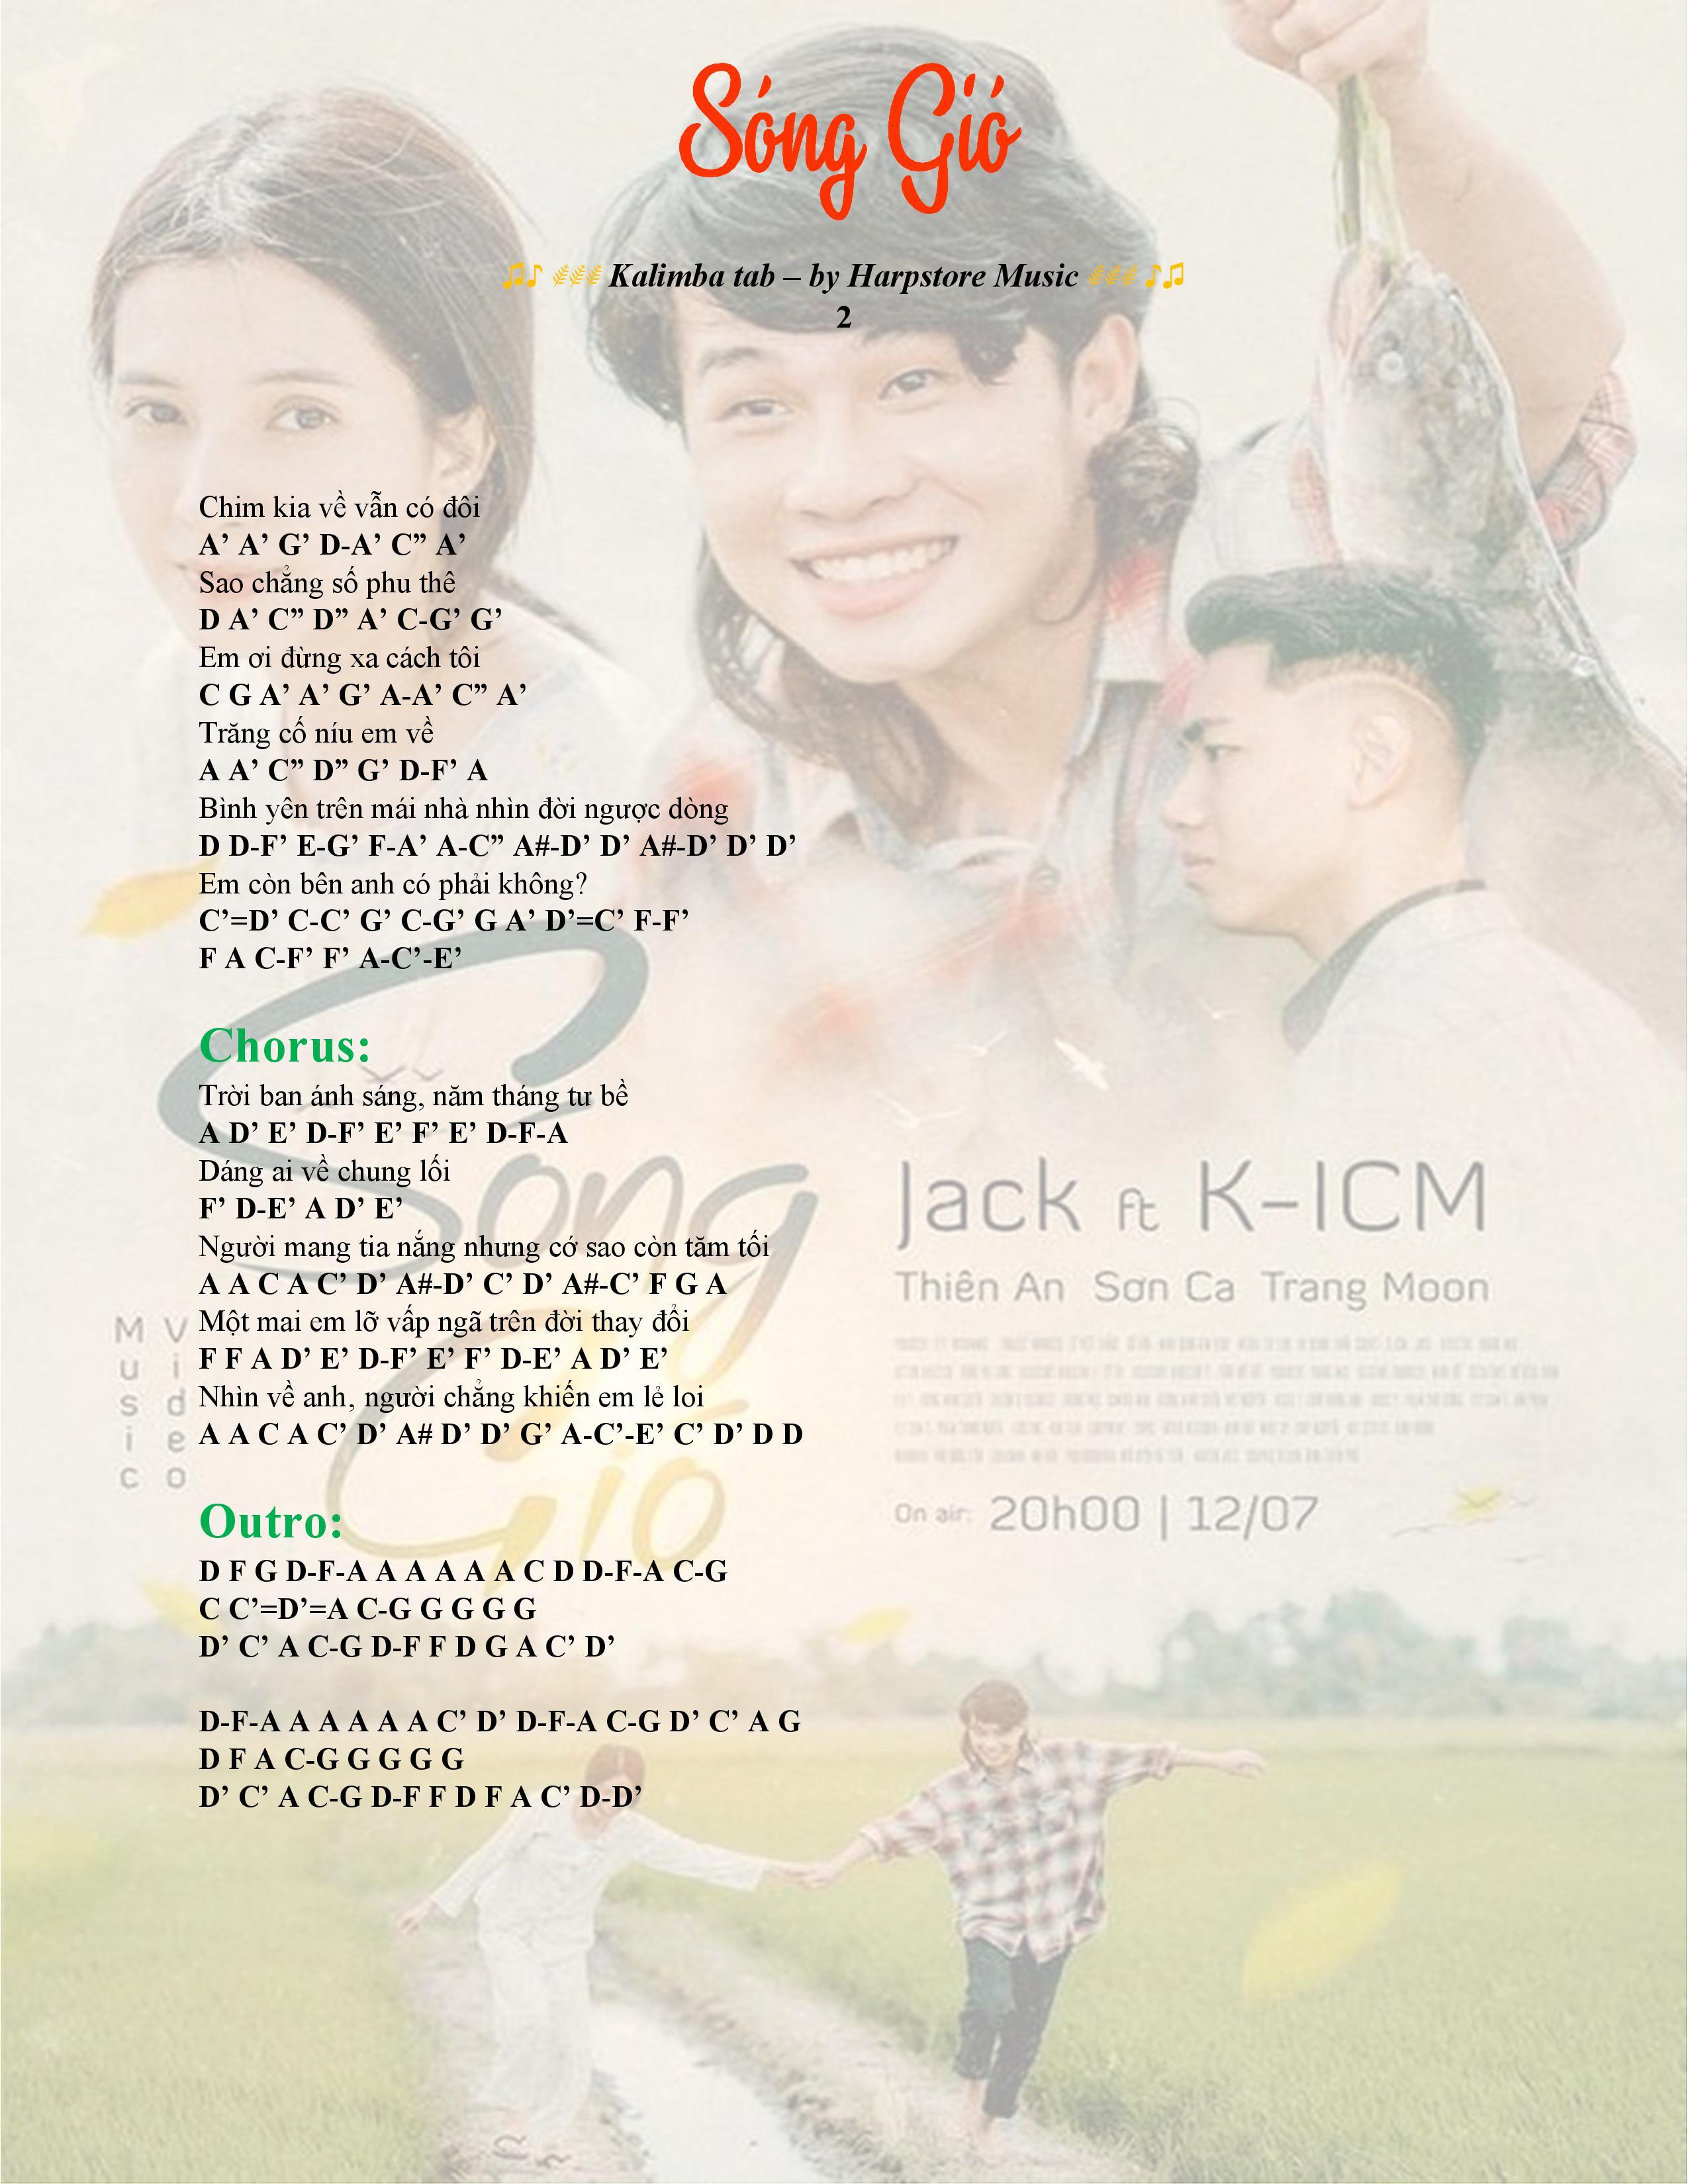 Kalimb tab song gio kicm jack 02